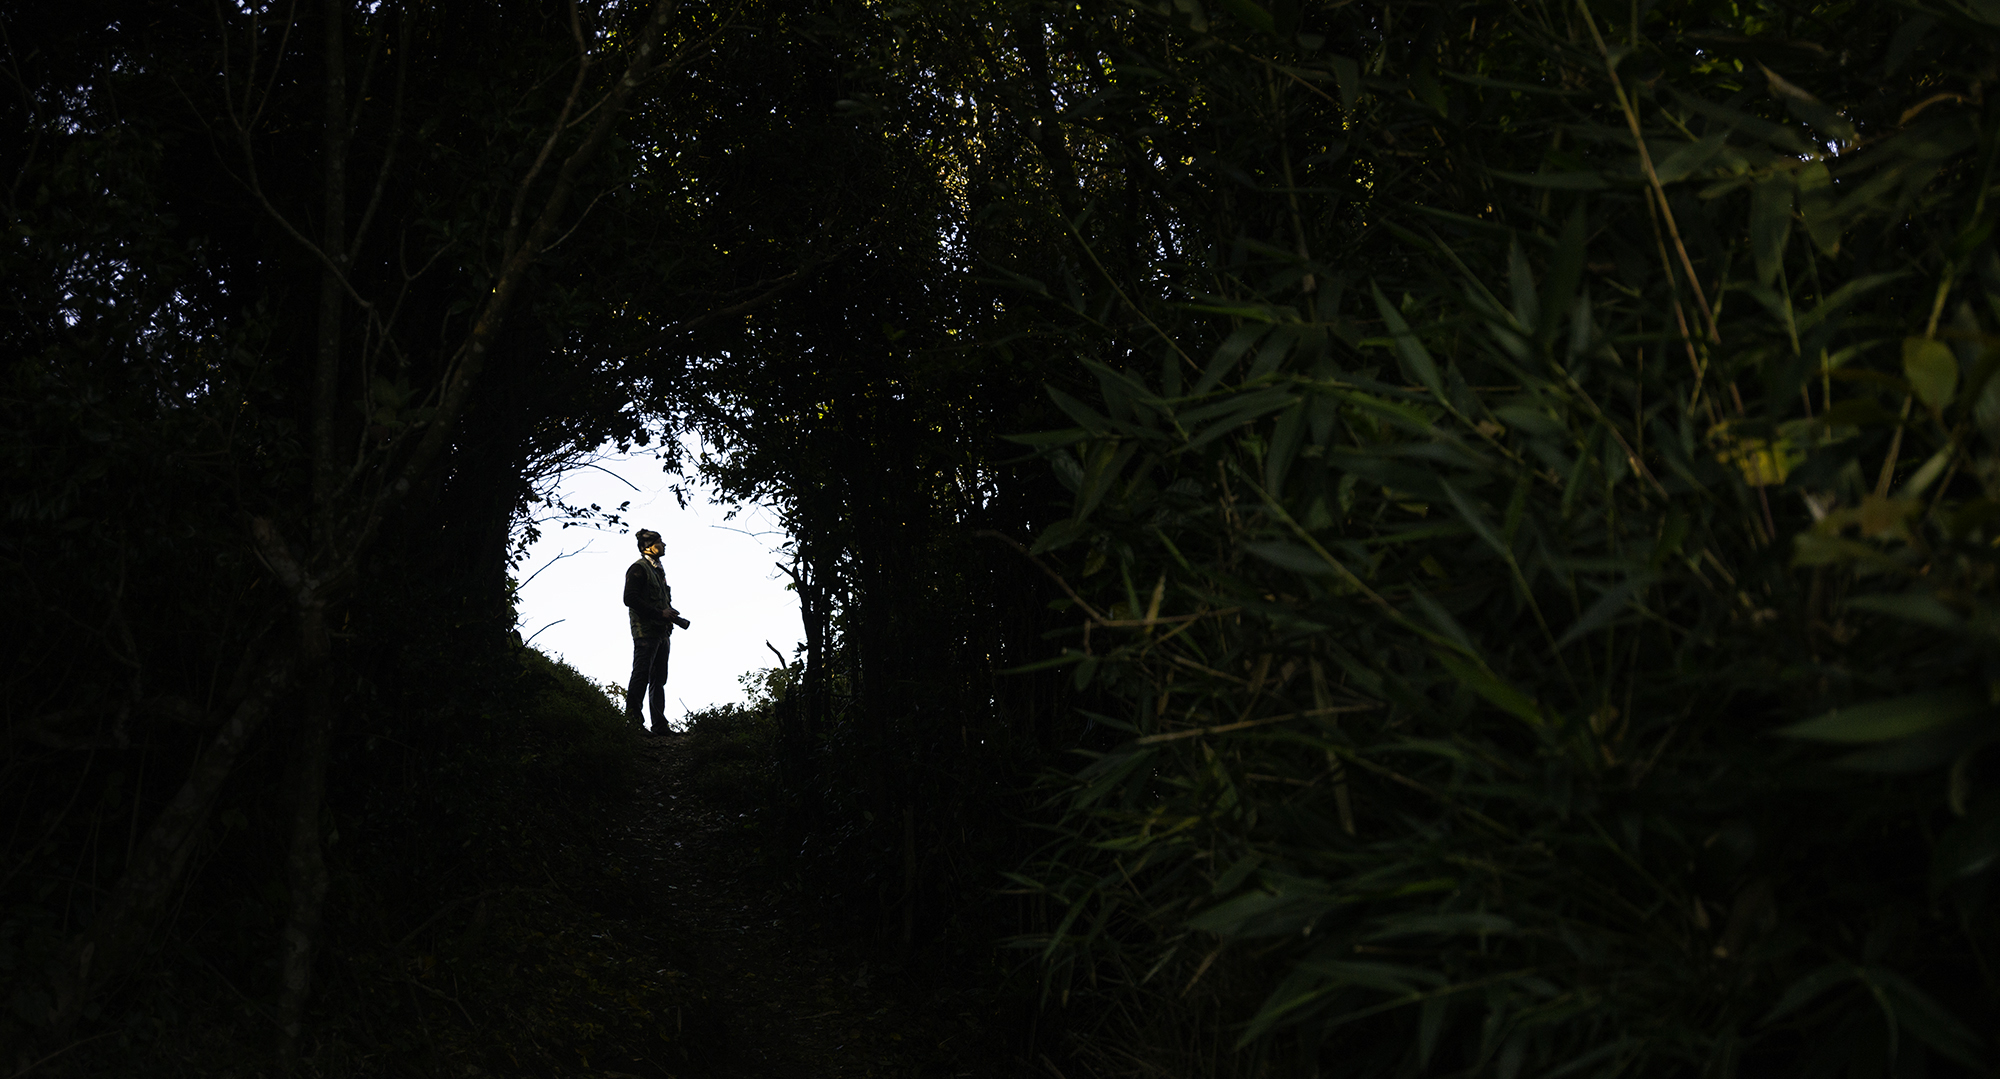 Framed inside the forest, frame inside a frame